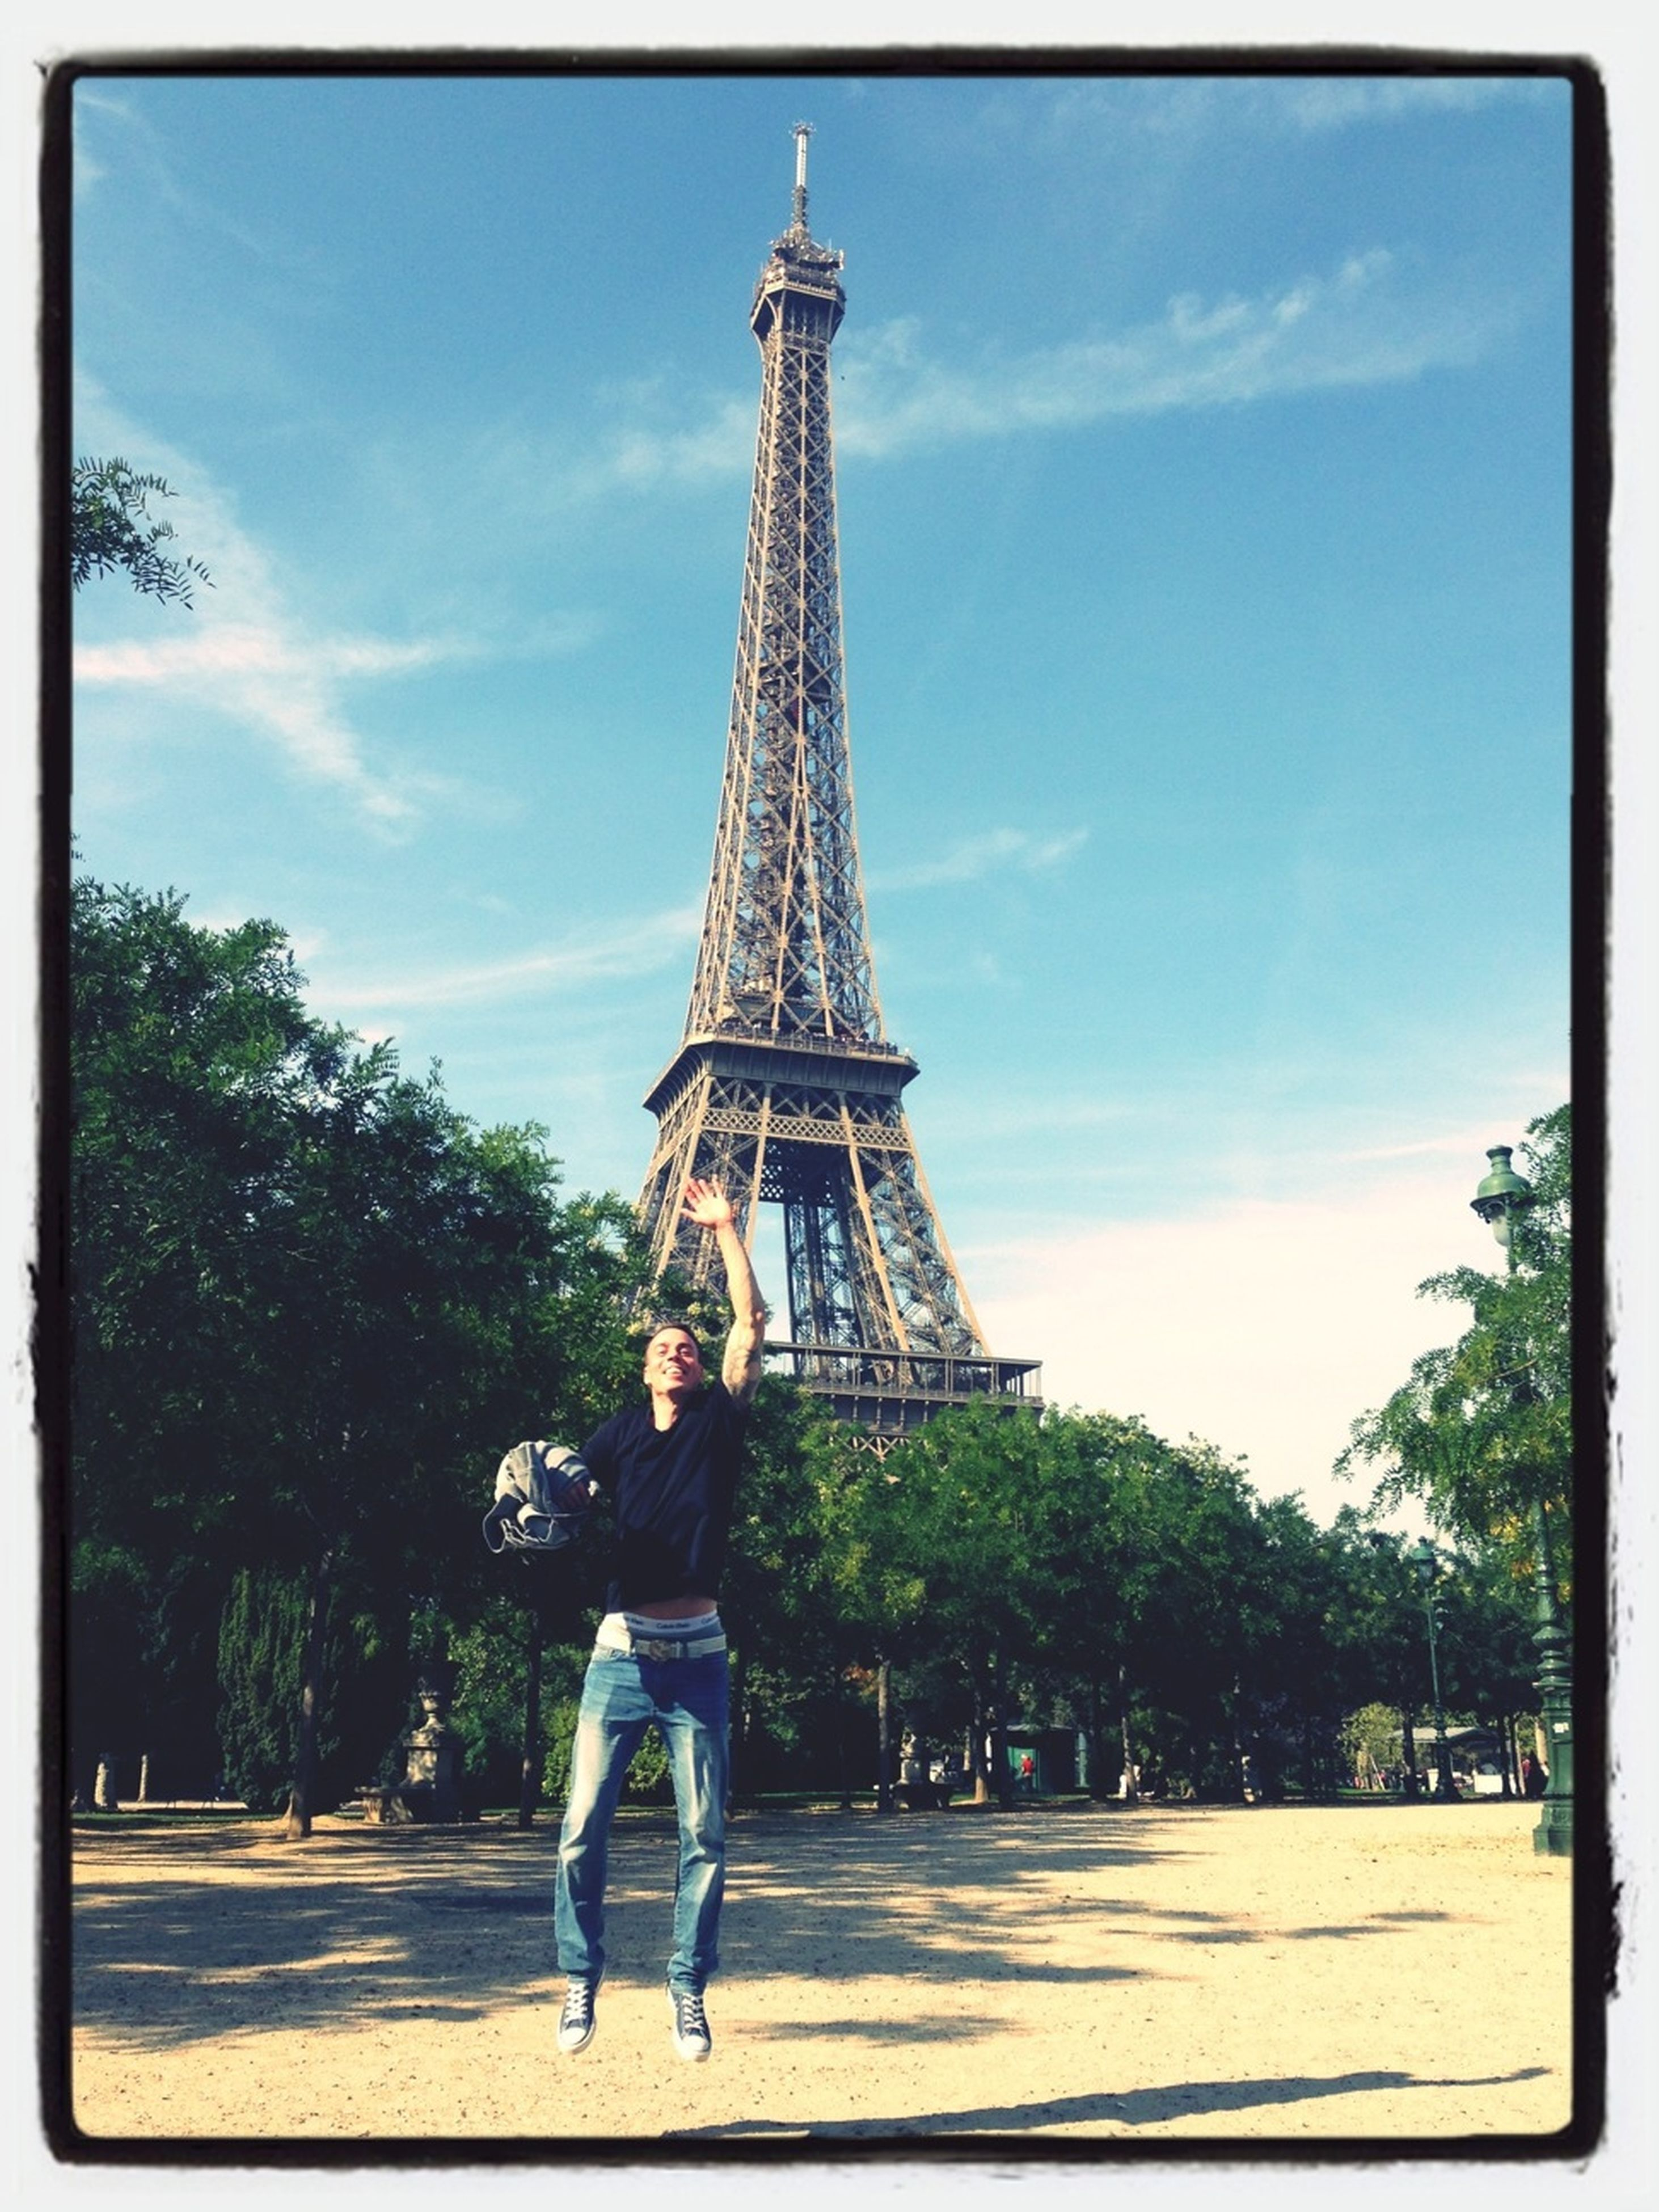 architecture, built structure, transfer print, sky, famous place, eiffel tower, lifestyles, tower, building exterior, tourism, travel destinations, leisure activity, international landmark, capital cities, person, tree, tall - high, travel, men